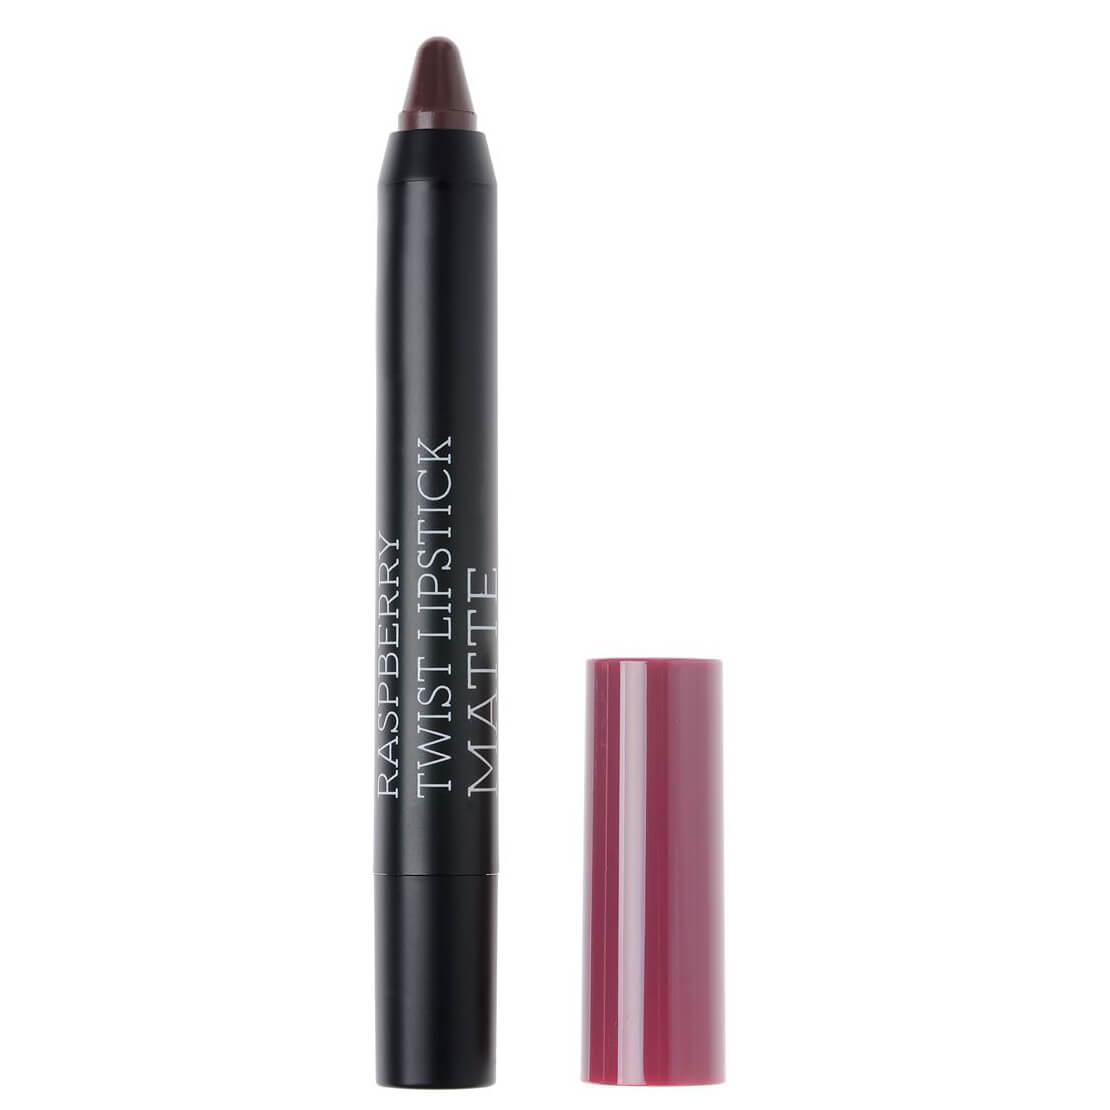 Korres Twist Lipstick Matte, Ultra Mat Αποτέλεσμα, Έντονο Χρώμα, Απόλυτη Άνεση στα Χείλη 1.5gr – Daring Plum